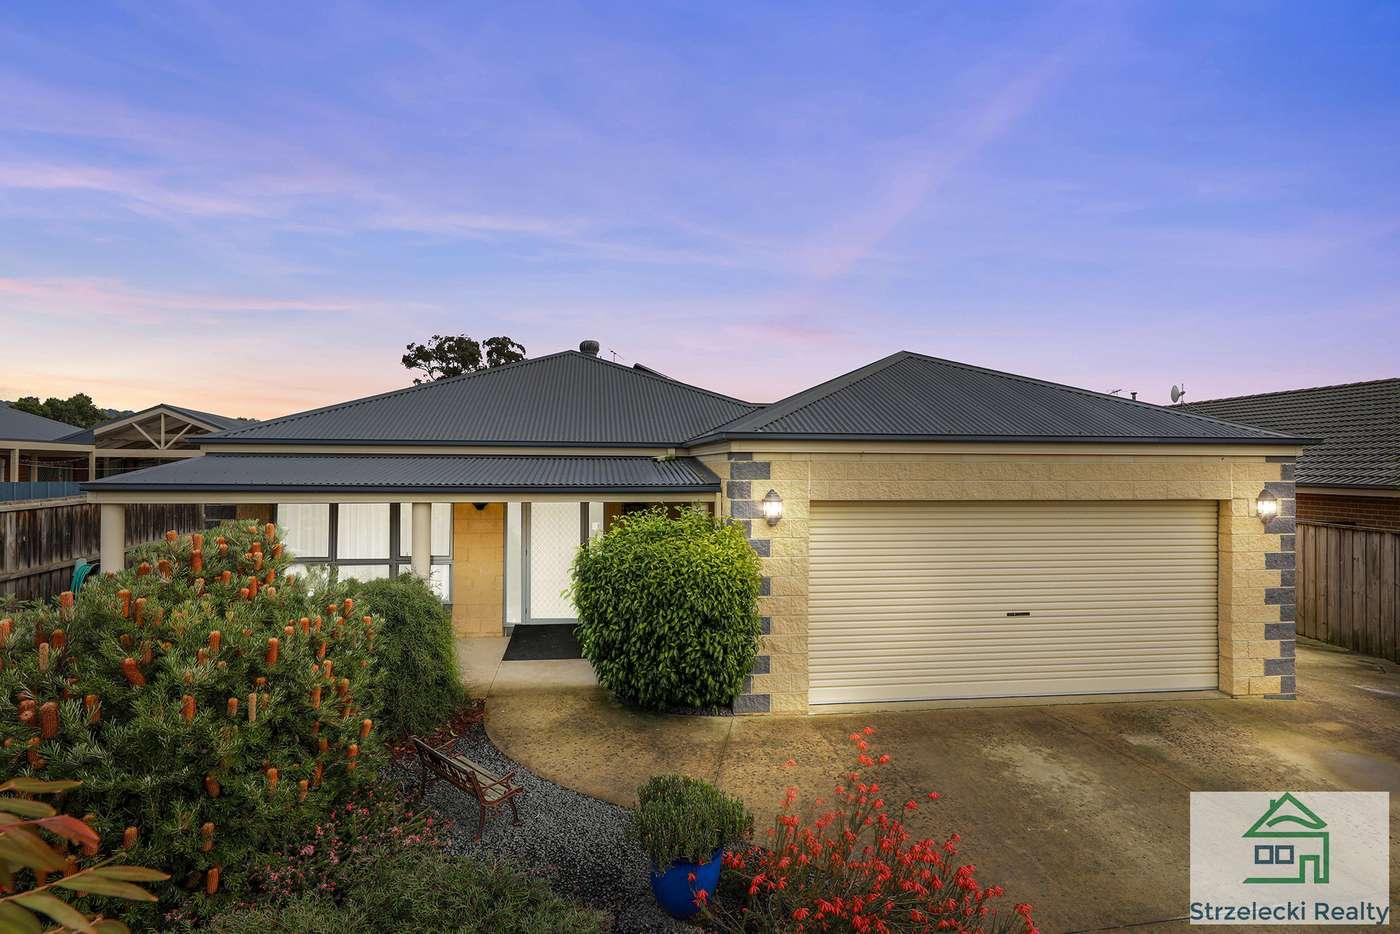 Main view of Homely house listing, 43 Murray St, Trafalgar VIC 3824